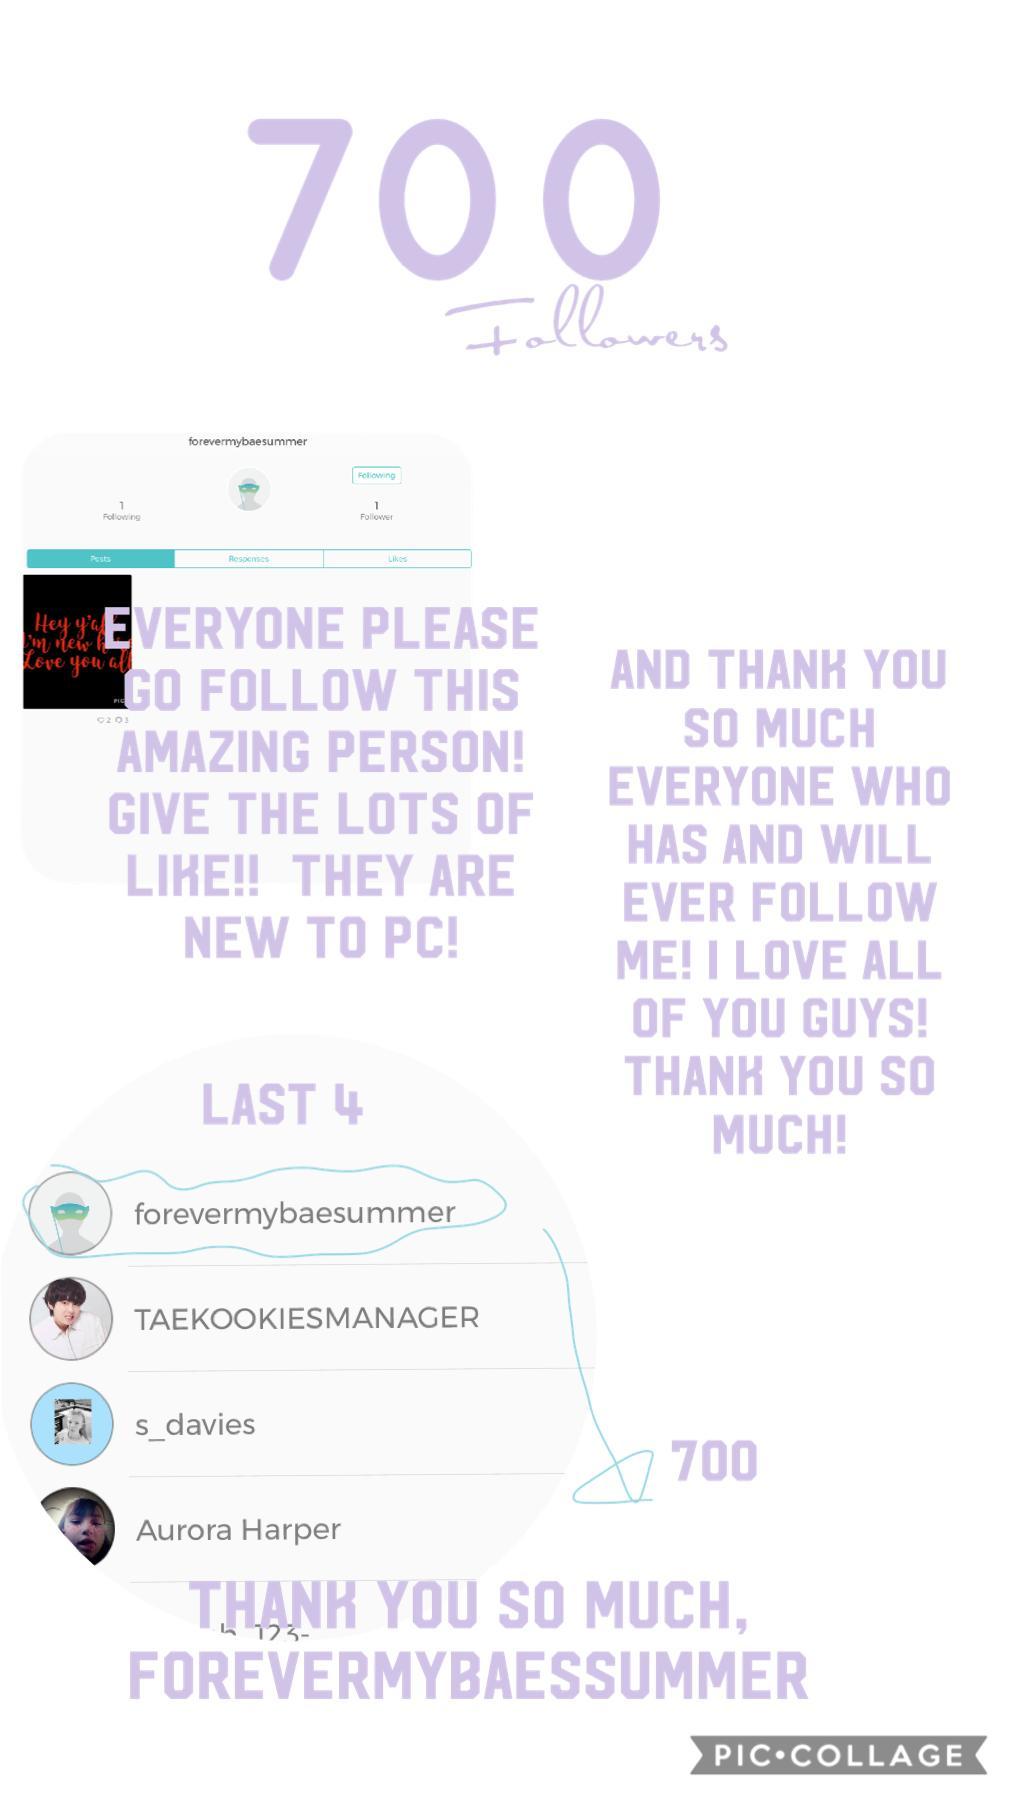 Thanks so much!